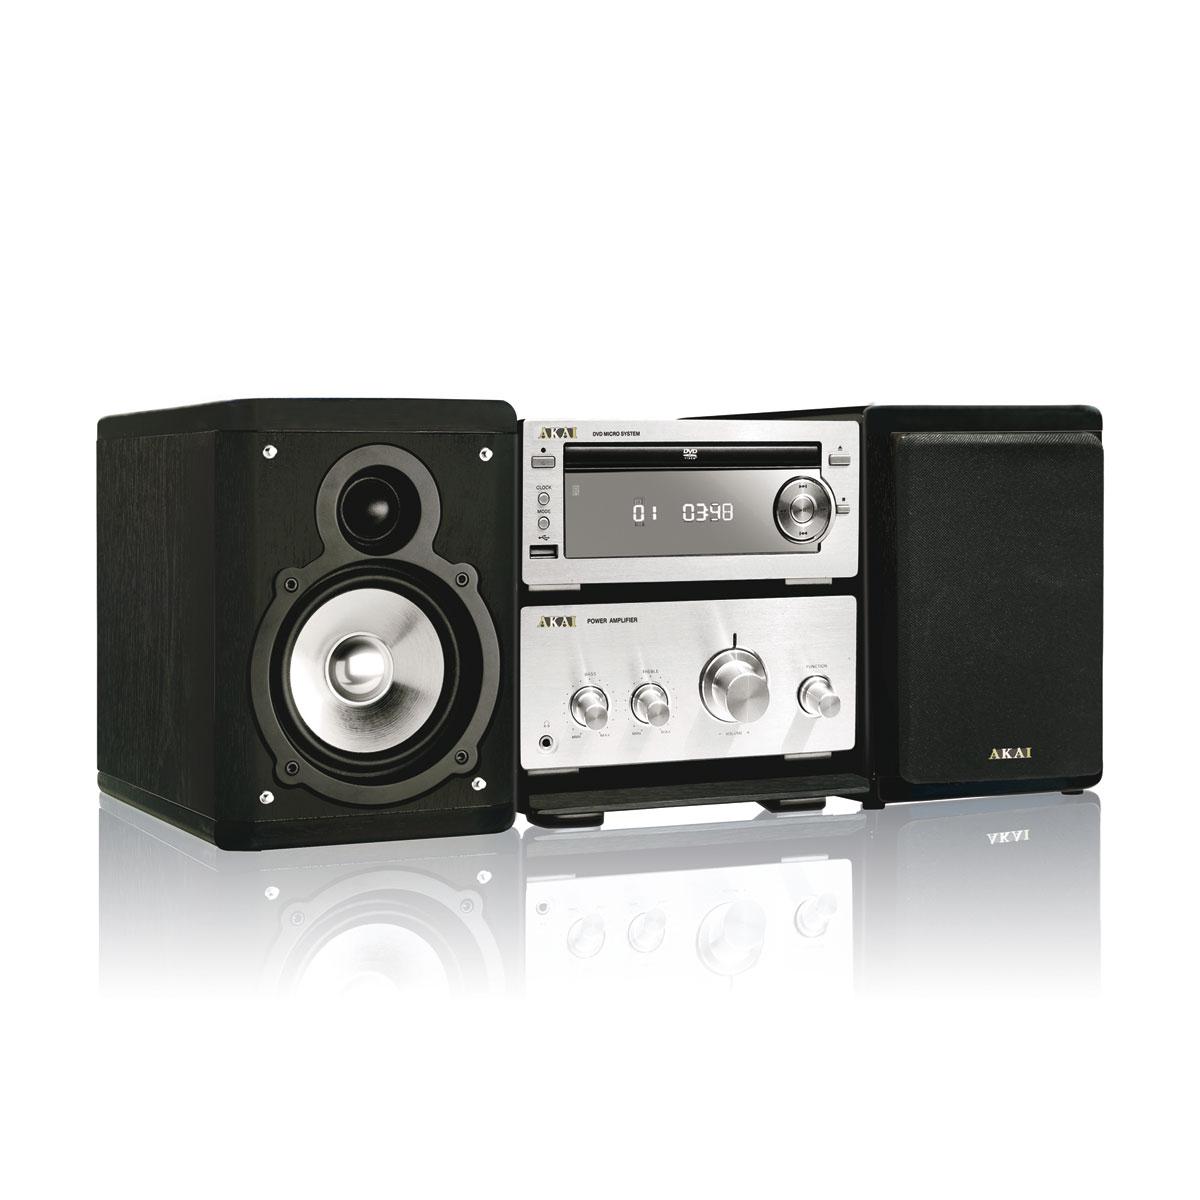 Chaîne Hifi Akai AMD 60 Micro chaine DVD MP3 USB avec sortie HDMI